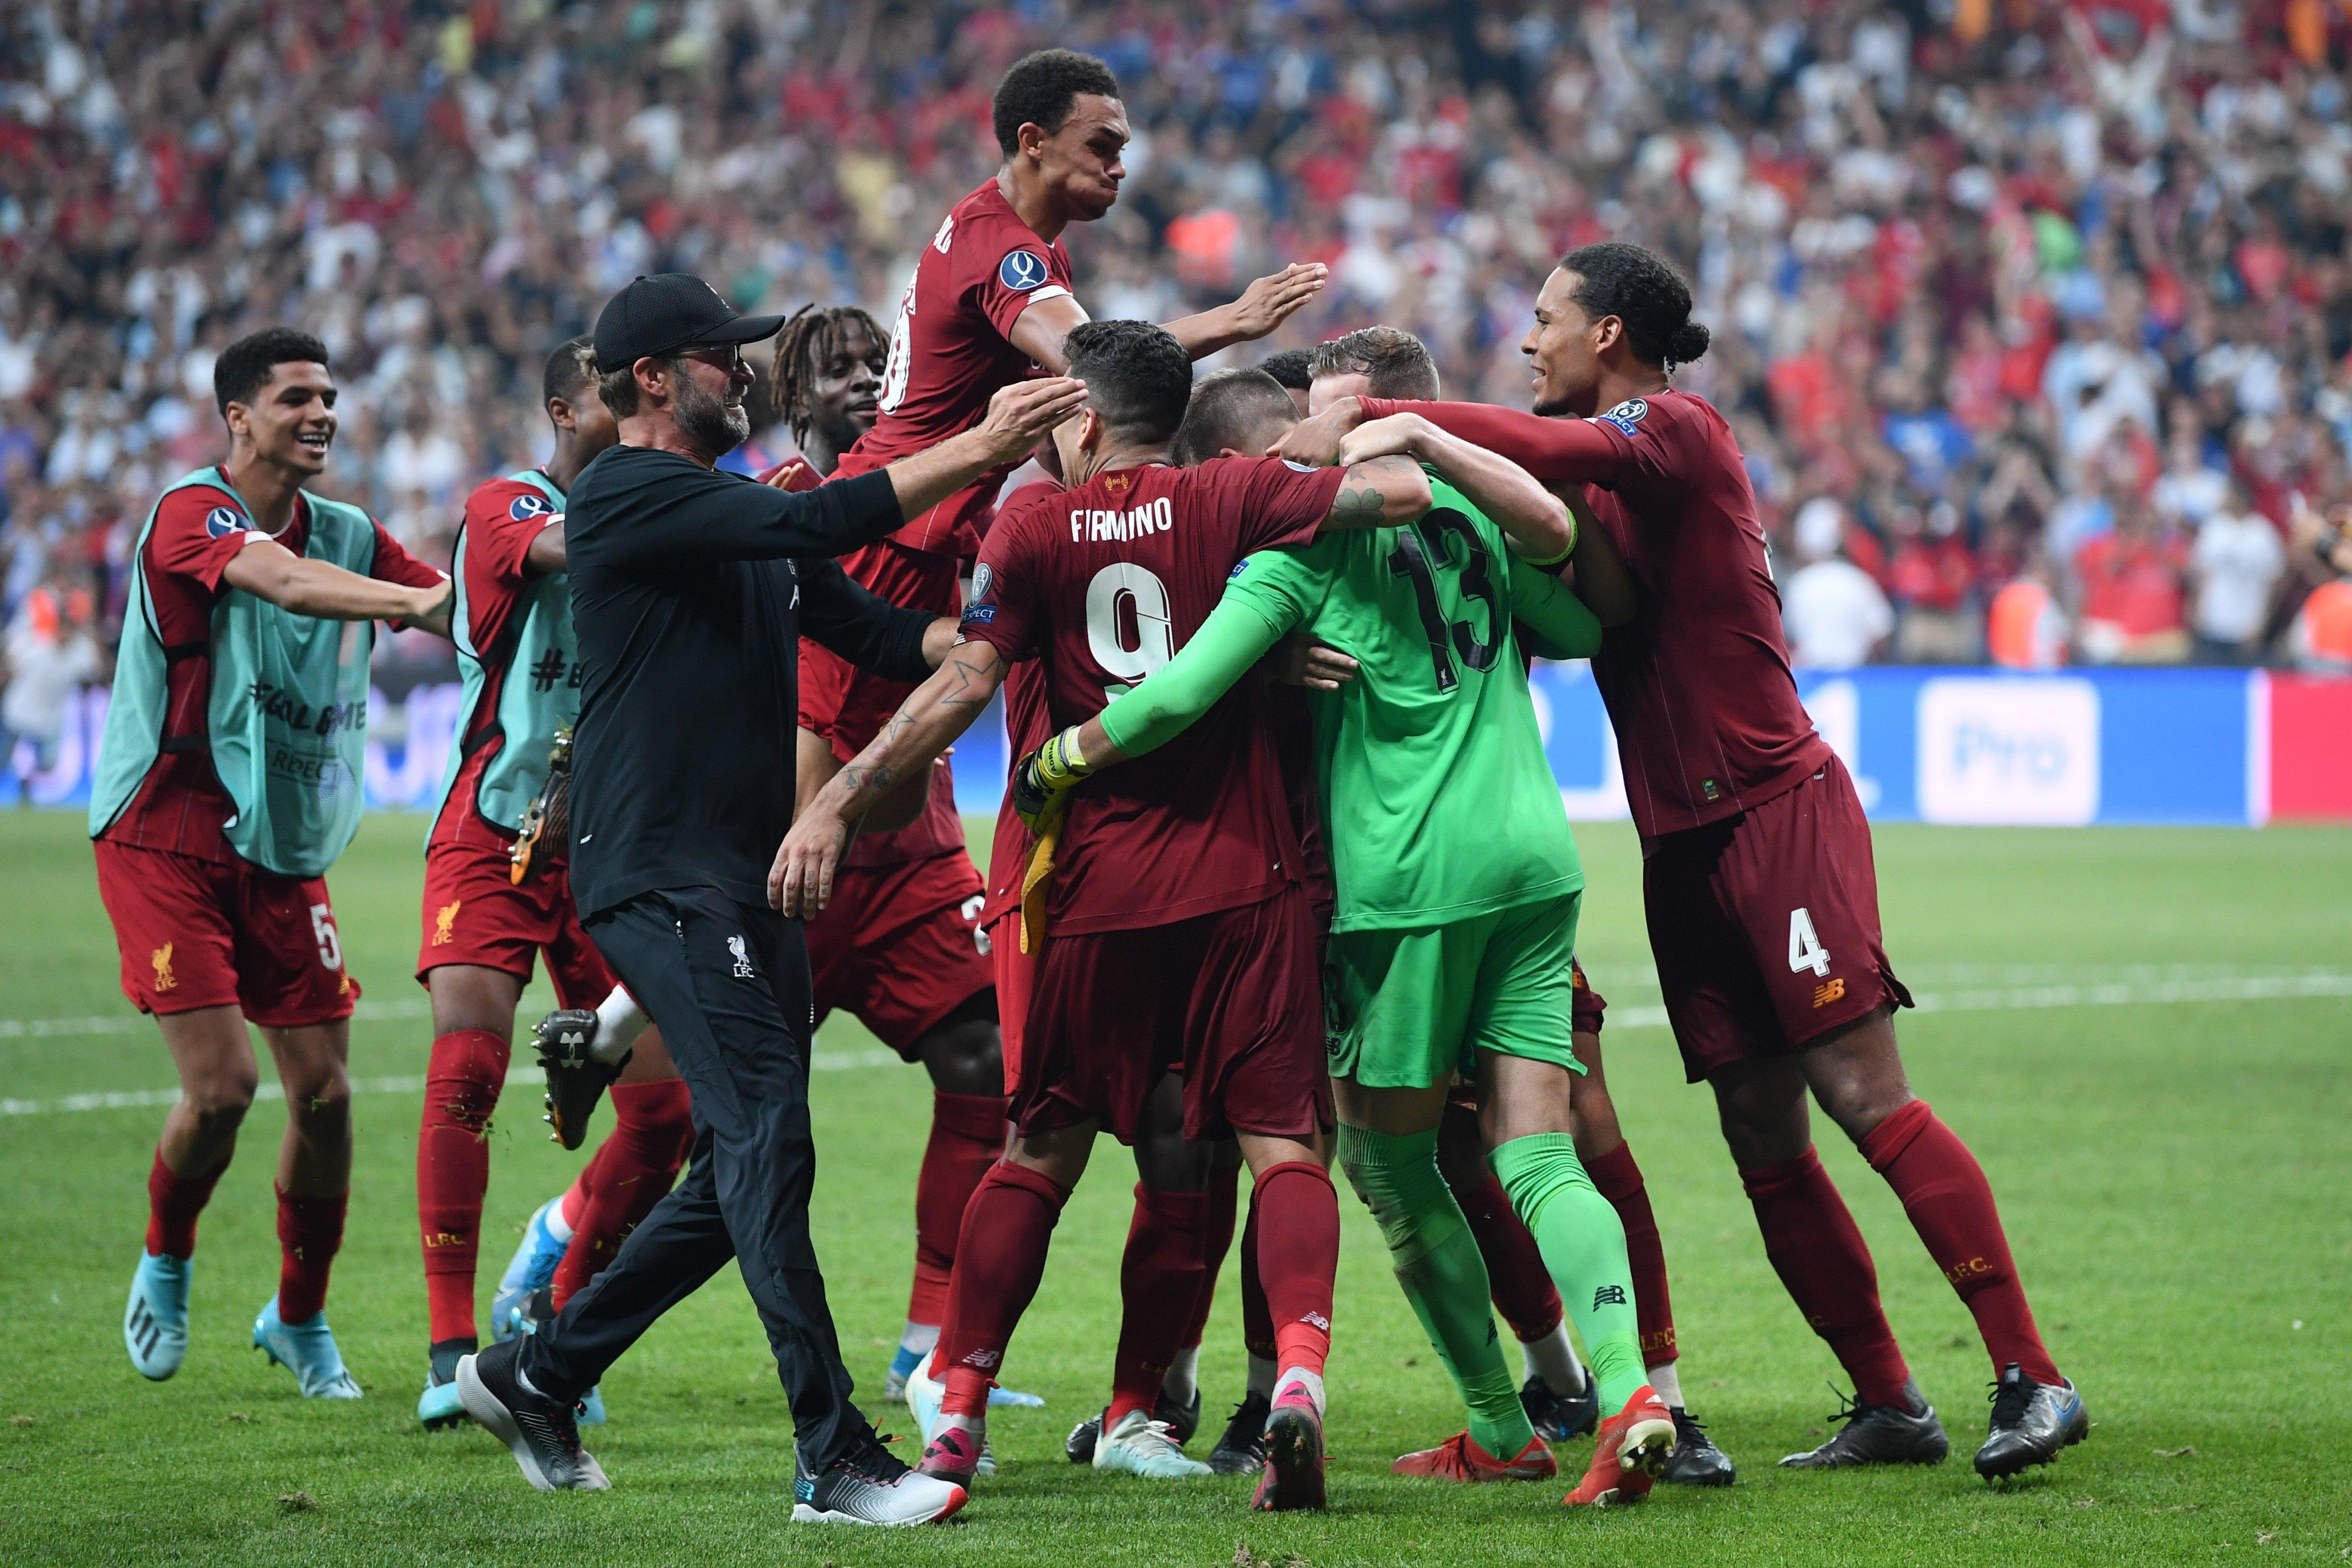 لیگ برتر-لیورپول-قرمزها-آلمان-انگلیس-England-Liverpool-Premier League-Germany